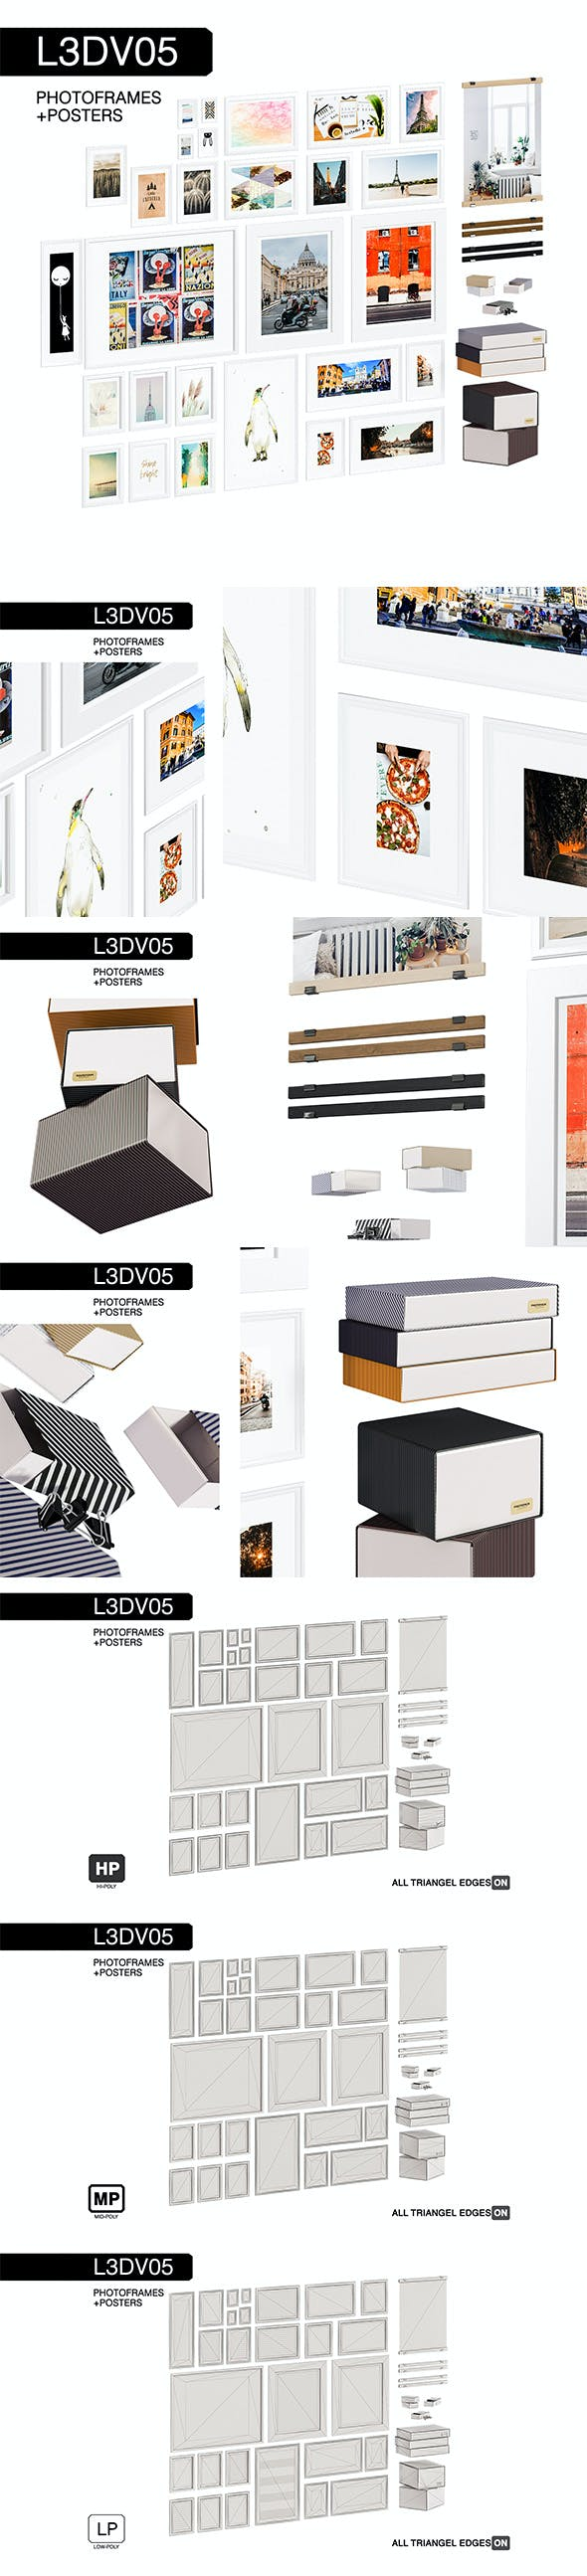 L3DV05G08 - photo frames boxes set - 3DOcean Item for Sale